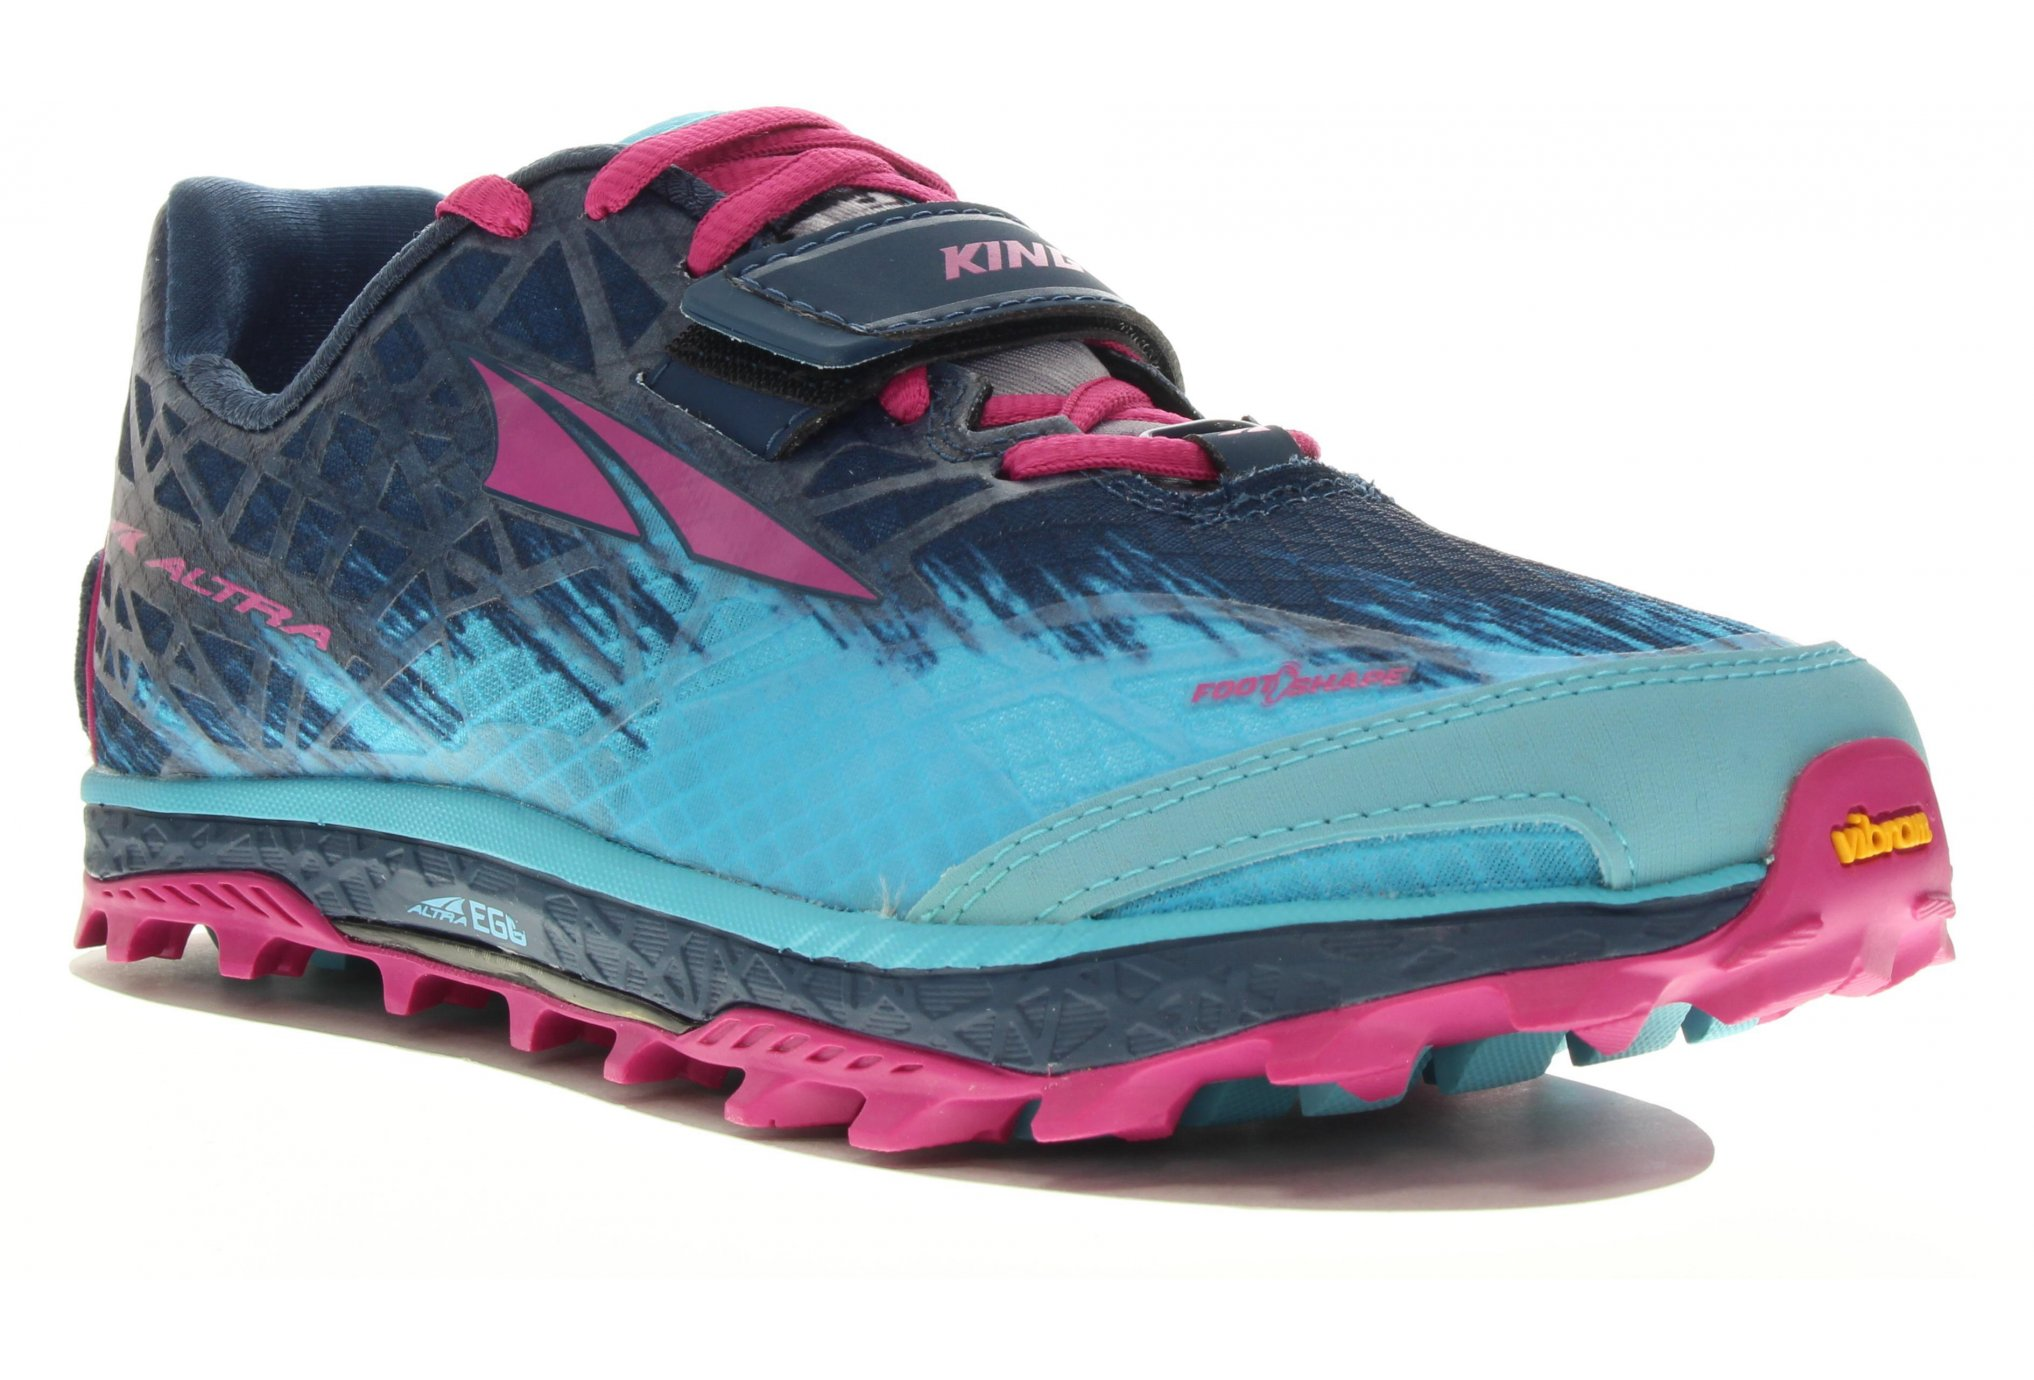 Altra King MT 1.5 Chaussures running femme